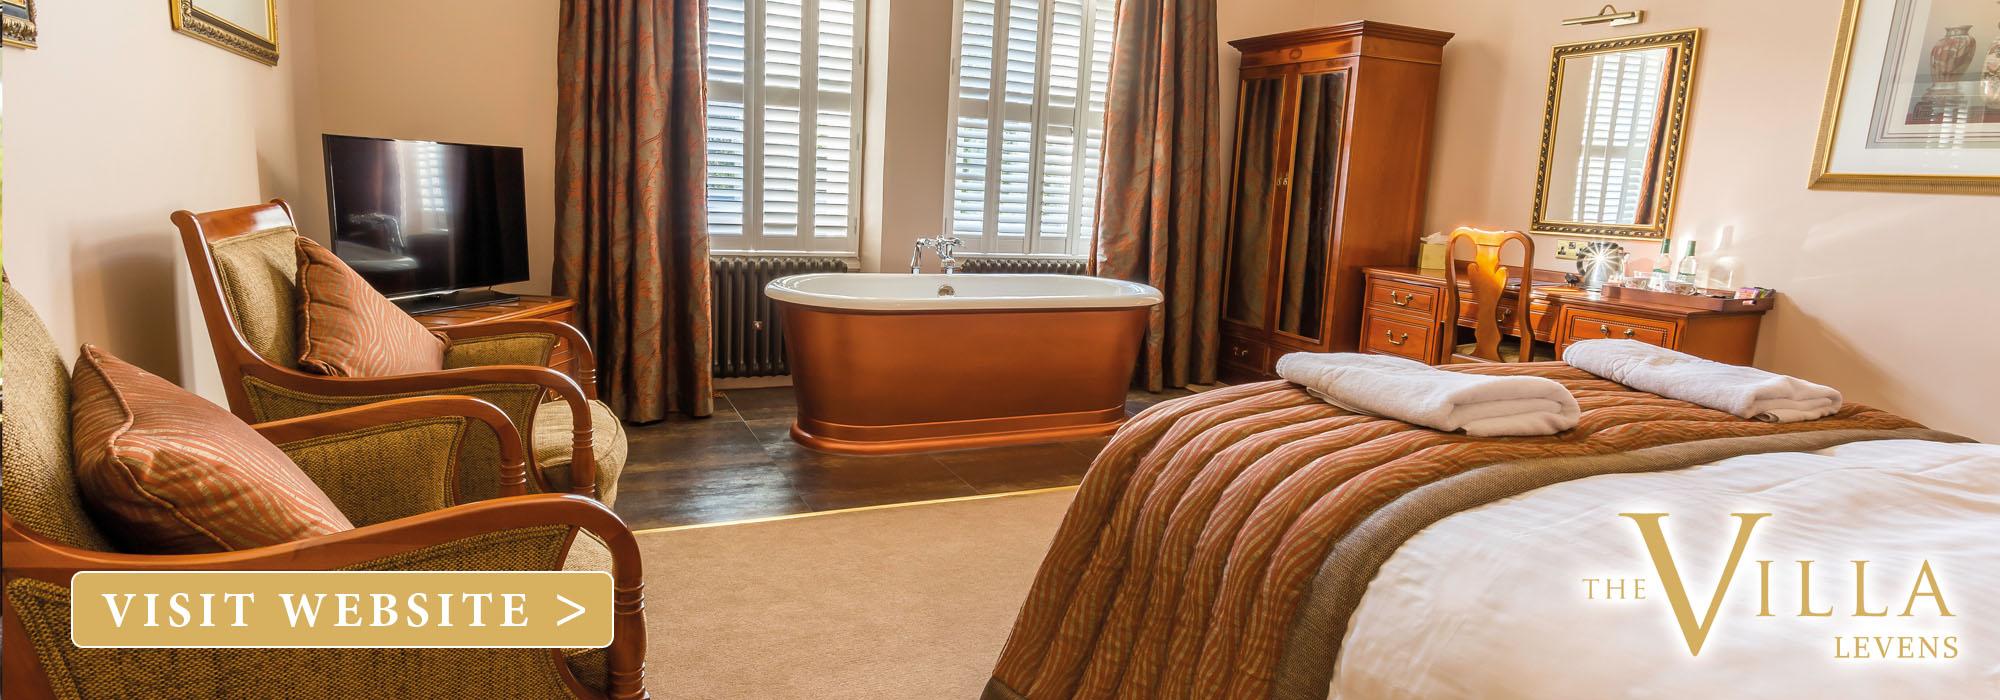 The villa levens hotel bedroom